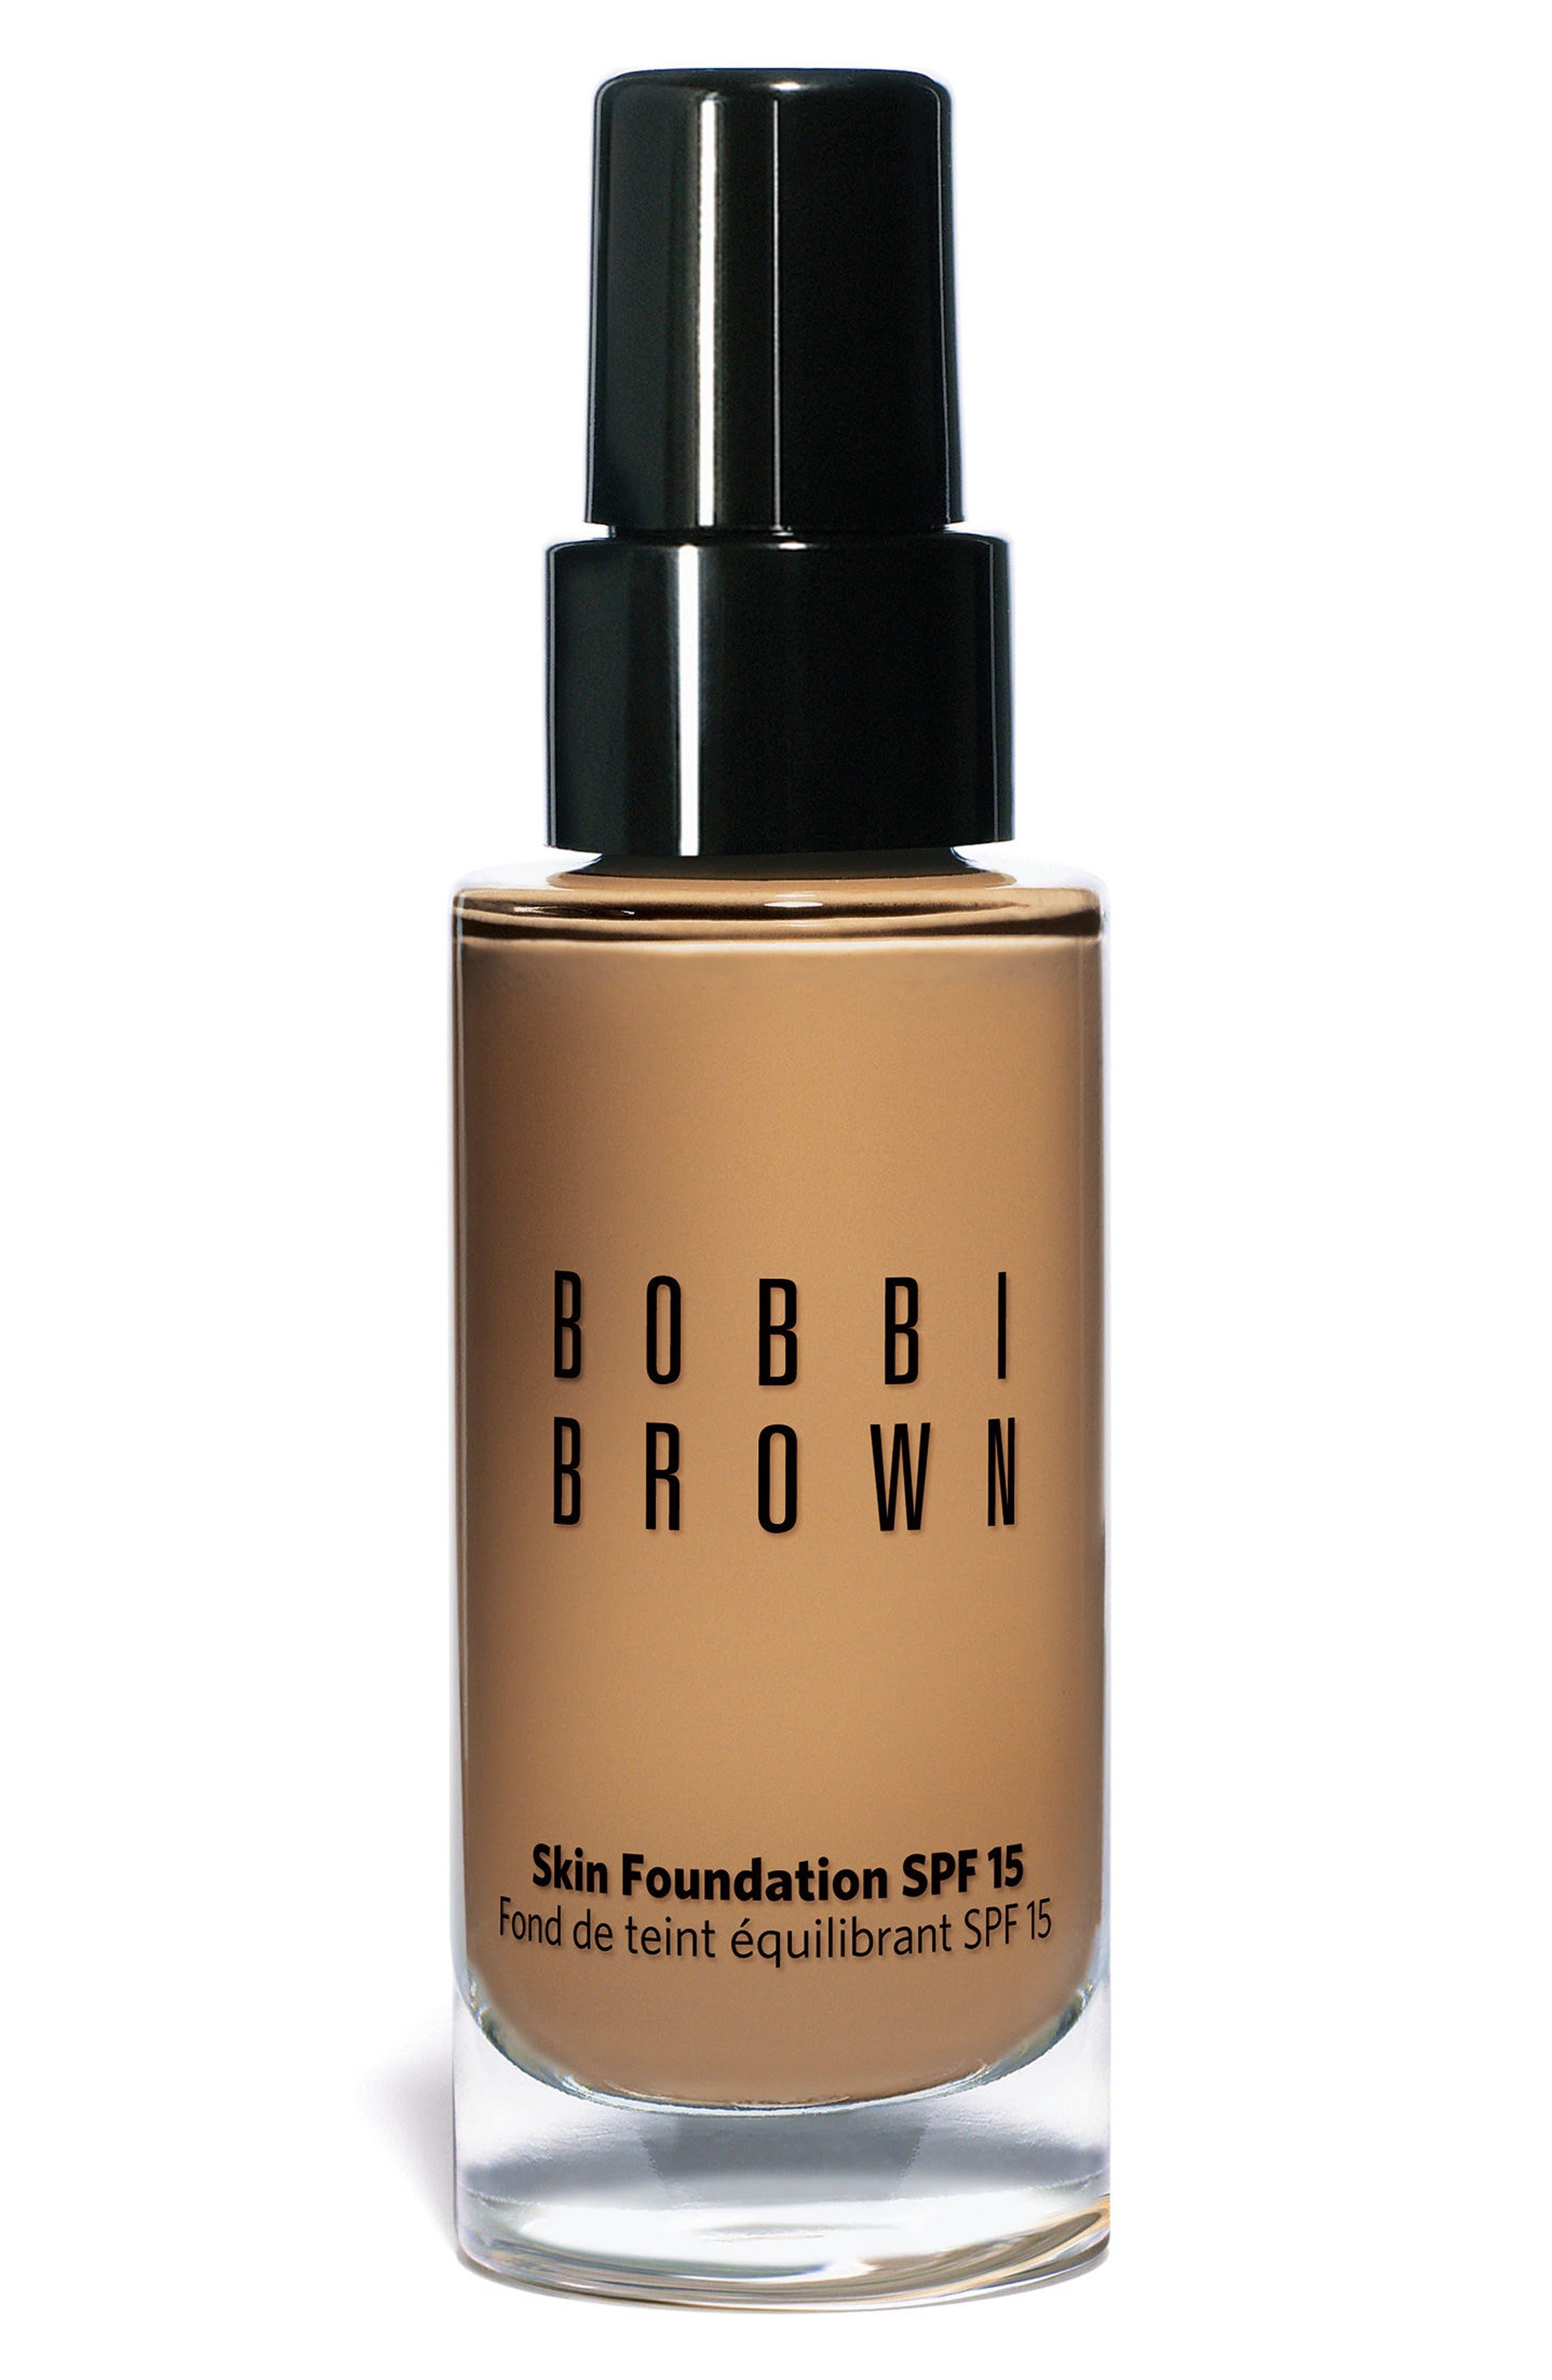 Skin Oil-Free Liquid Foundation Broad Spectrum Spf 15